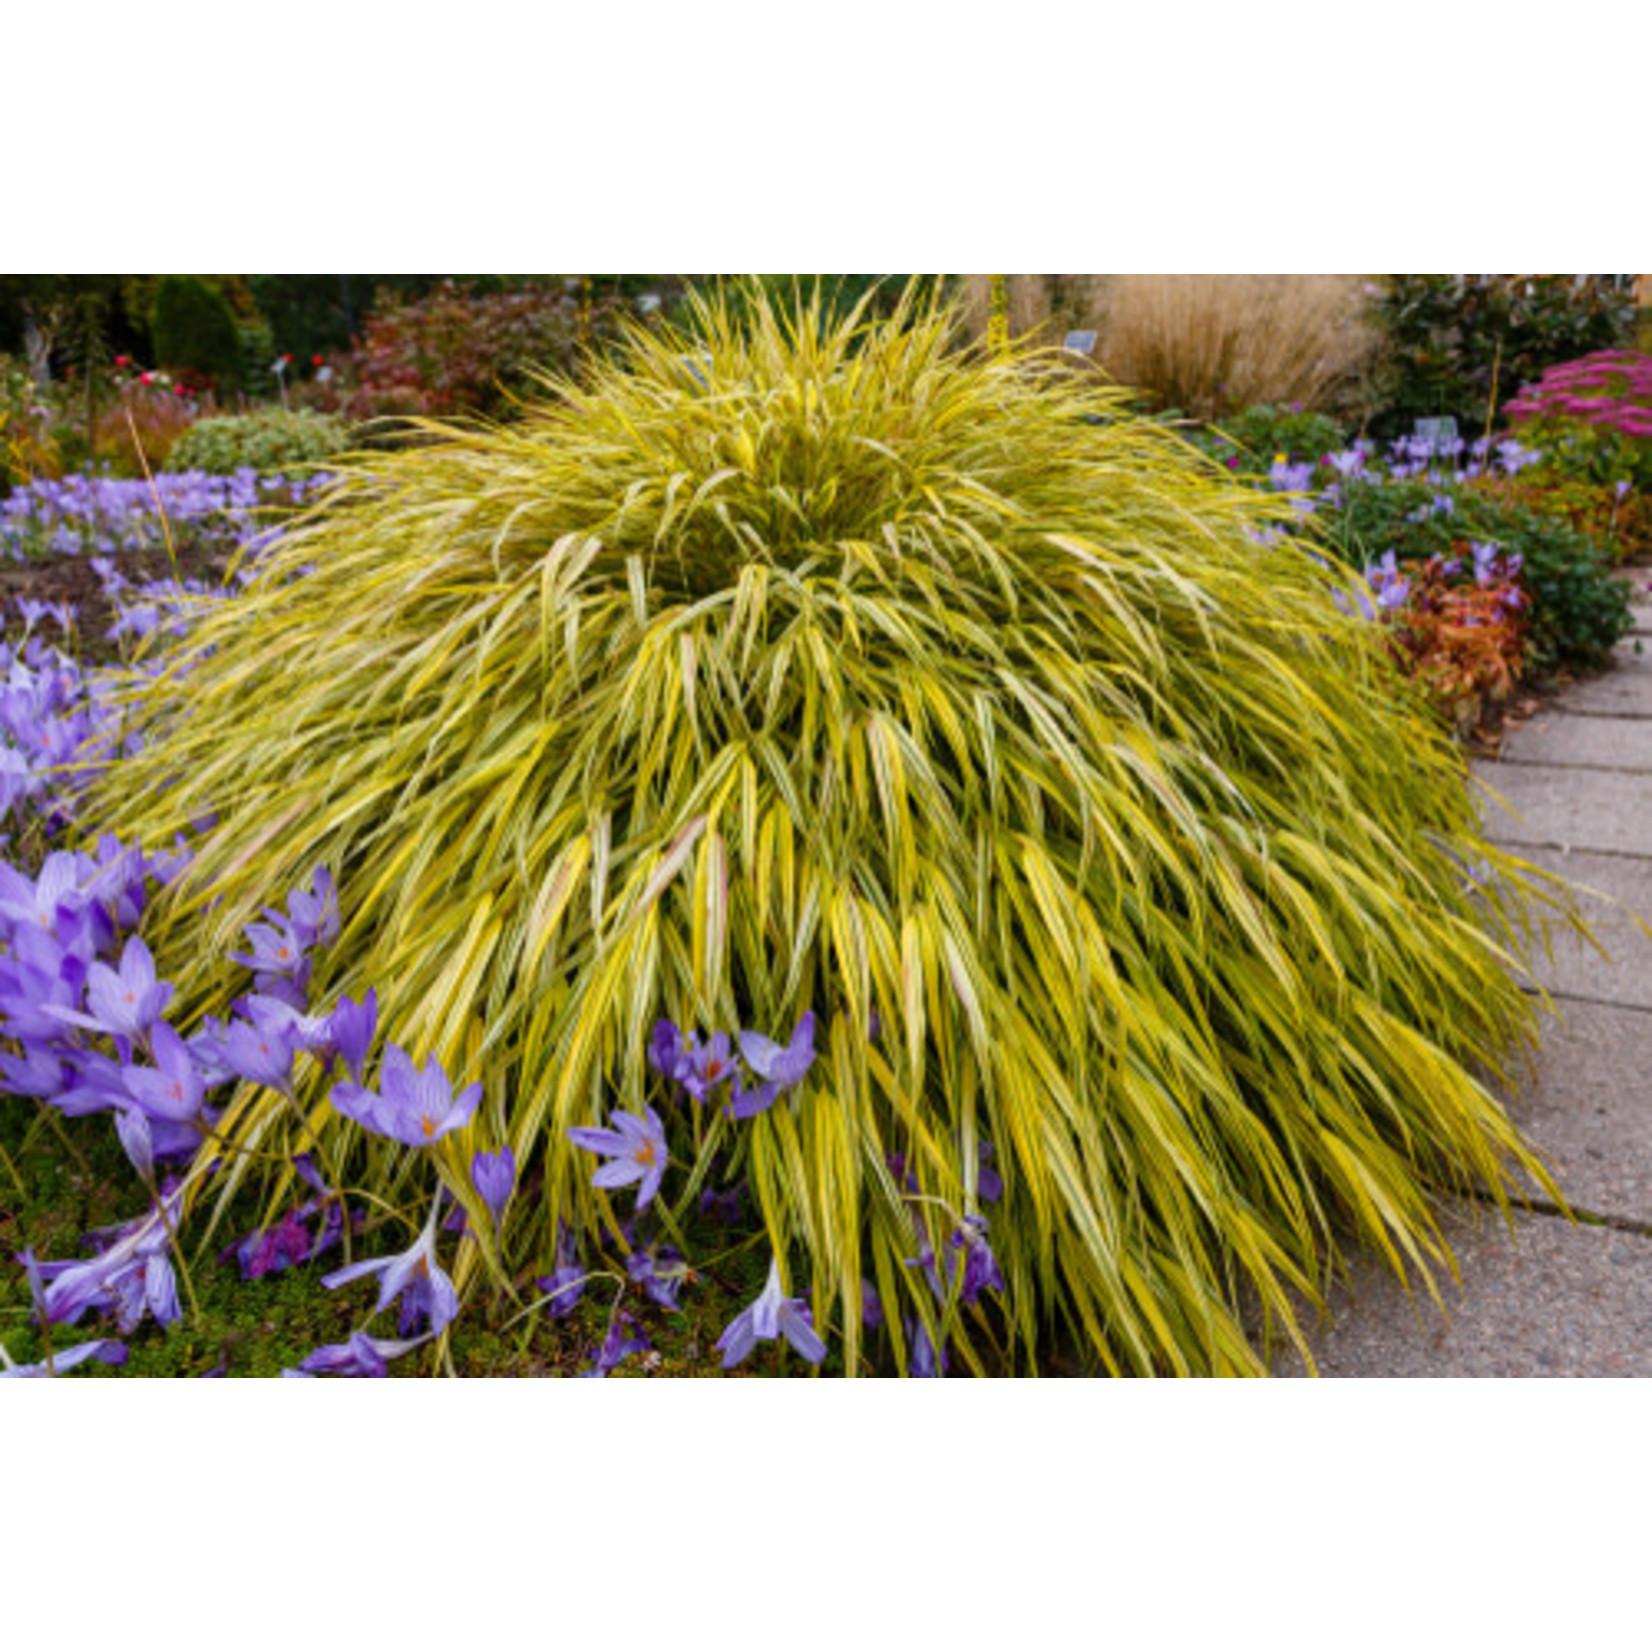 Japanese Forest Grass - hakonechloa 'aureola'